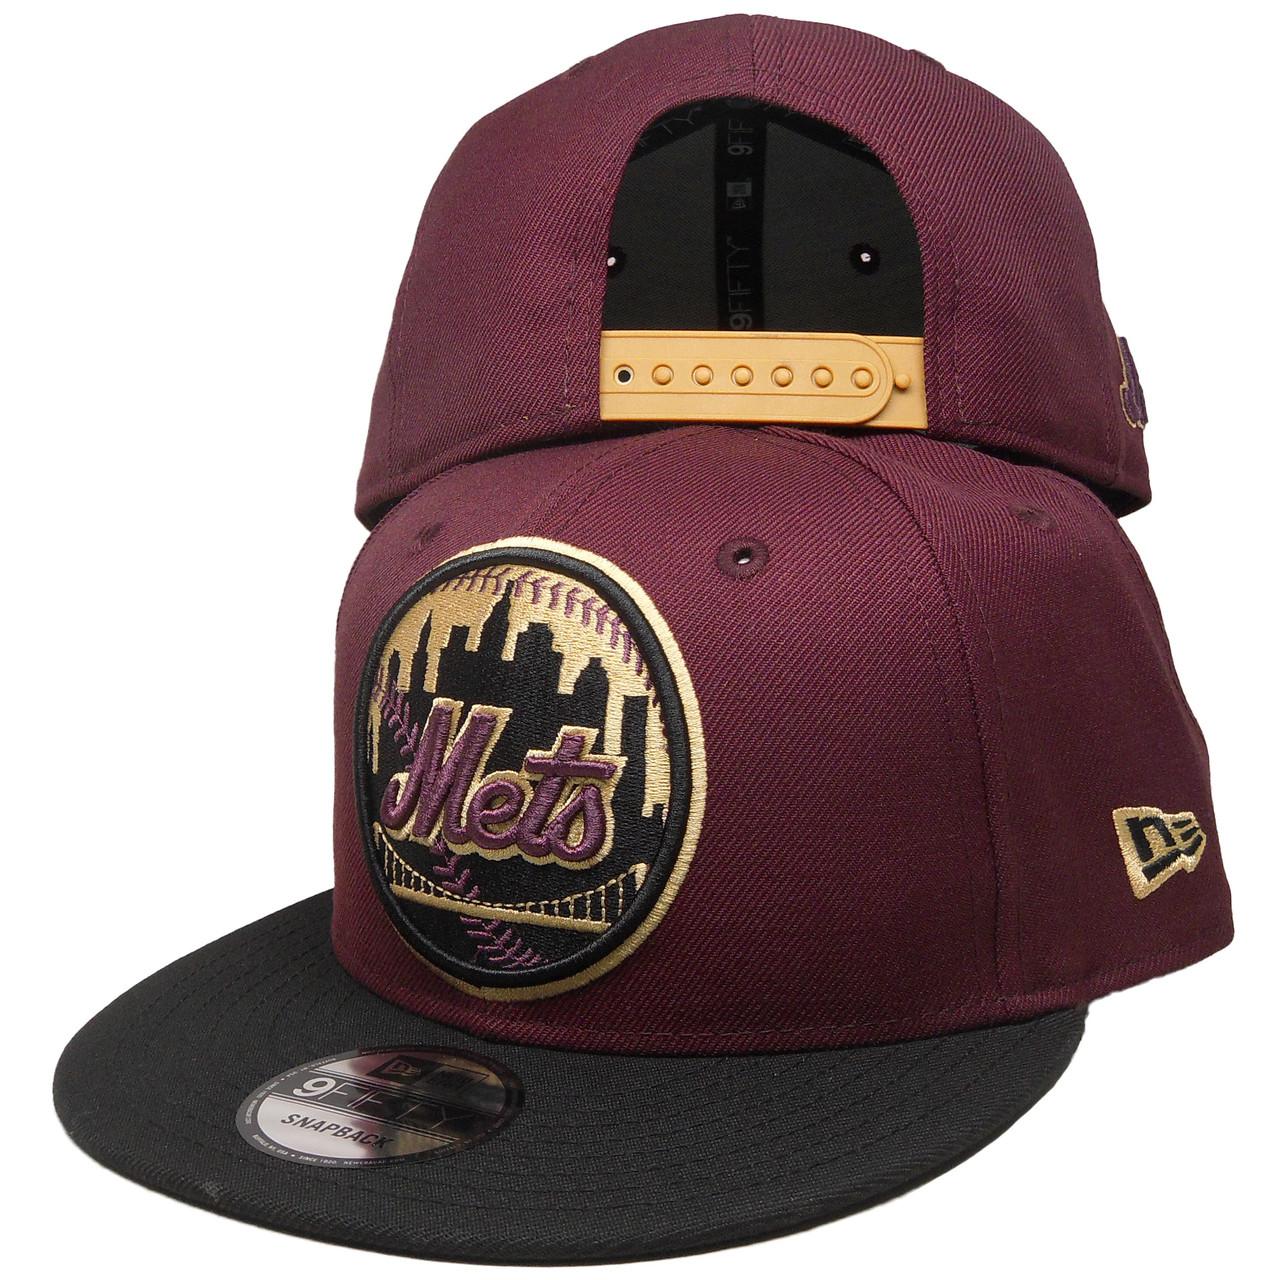 New York Mets New Era 9Fity Custom Snapback Hat - Maroon a7c105a7122